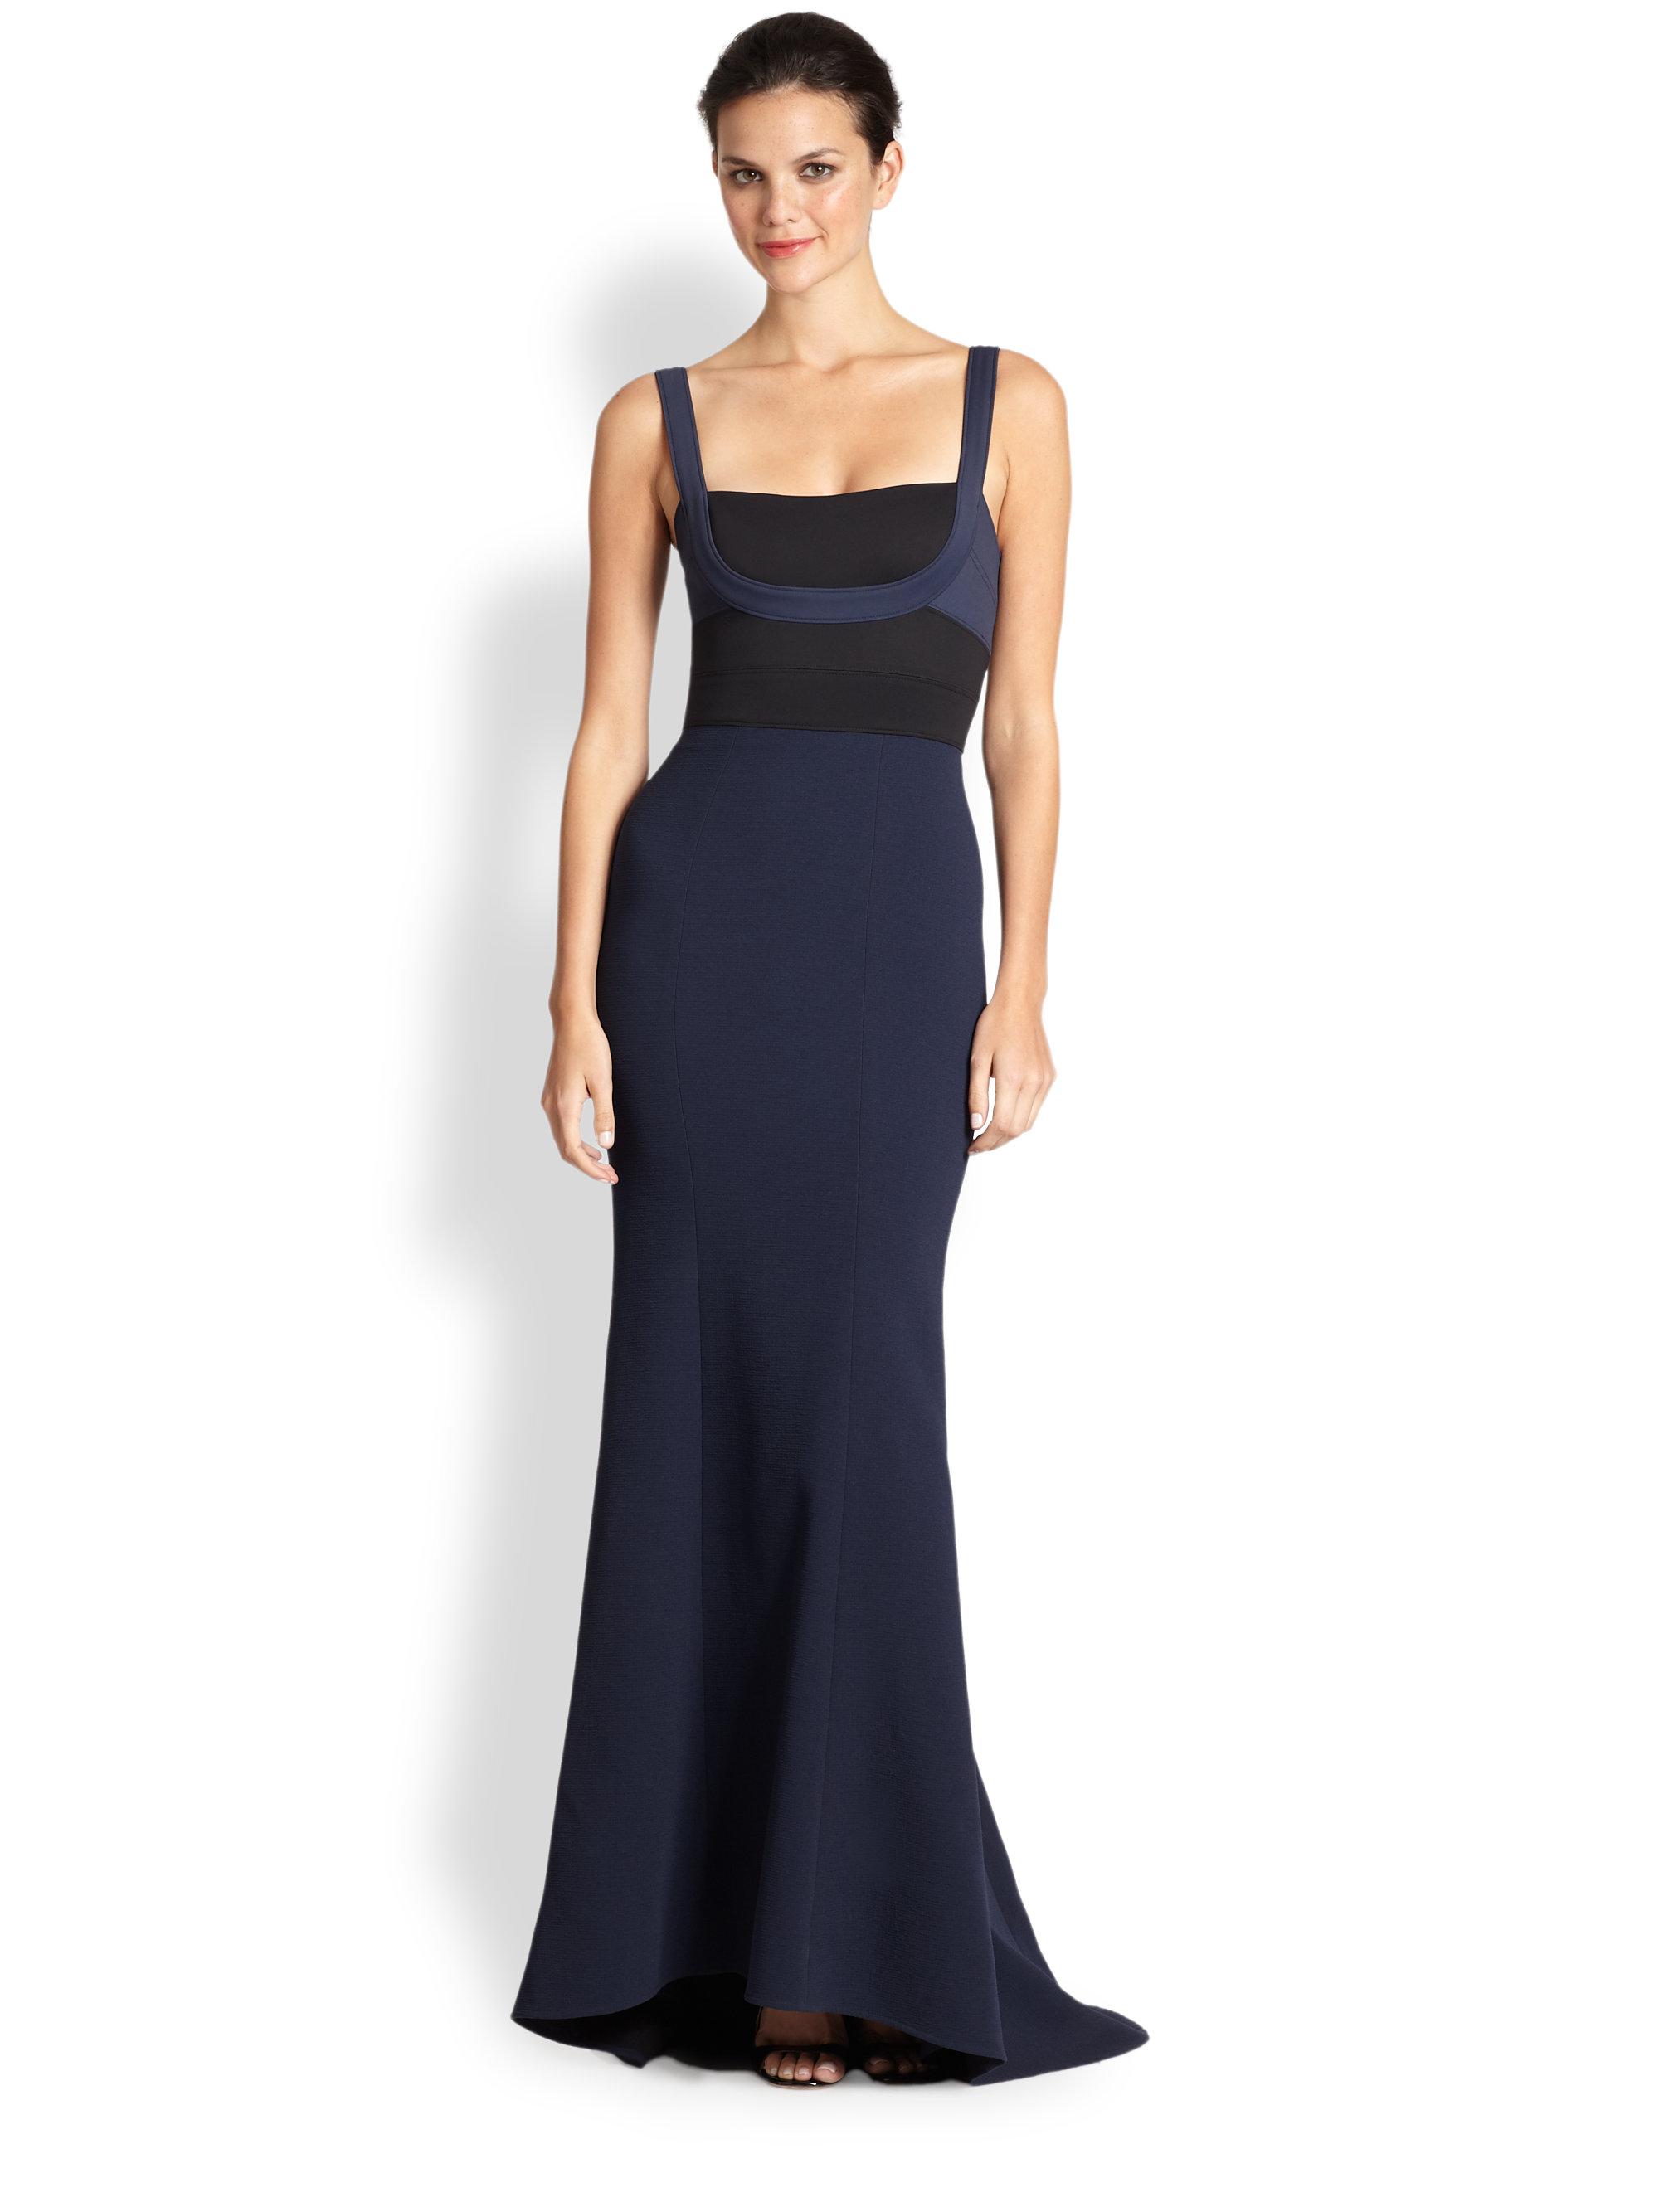 Lyst - Bcbgmaxazria Arabella Bodycon Gown in Blue